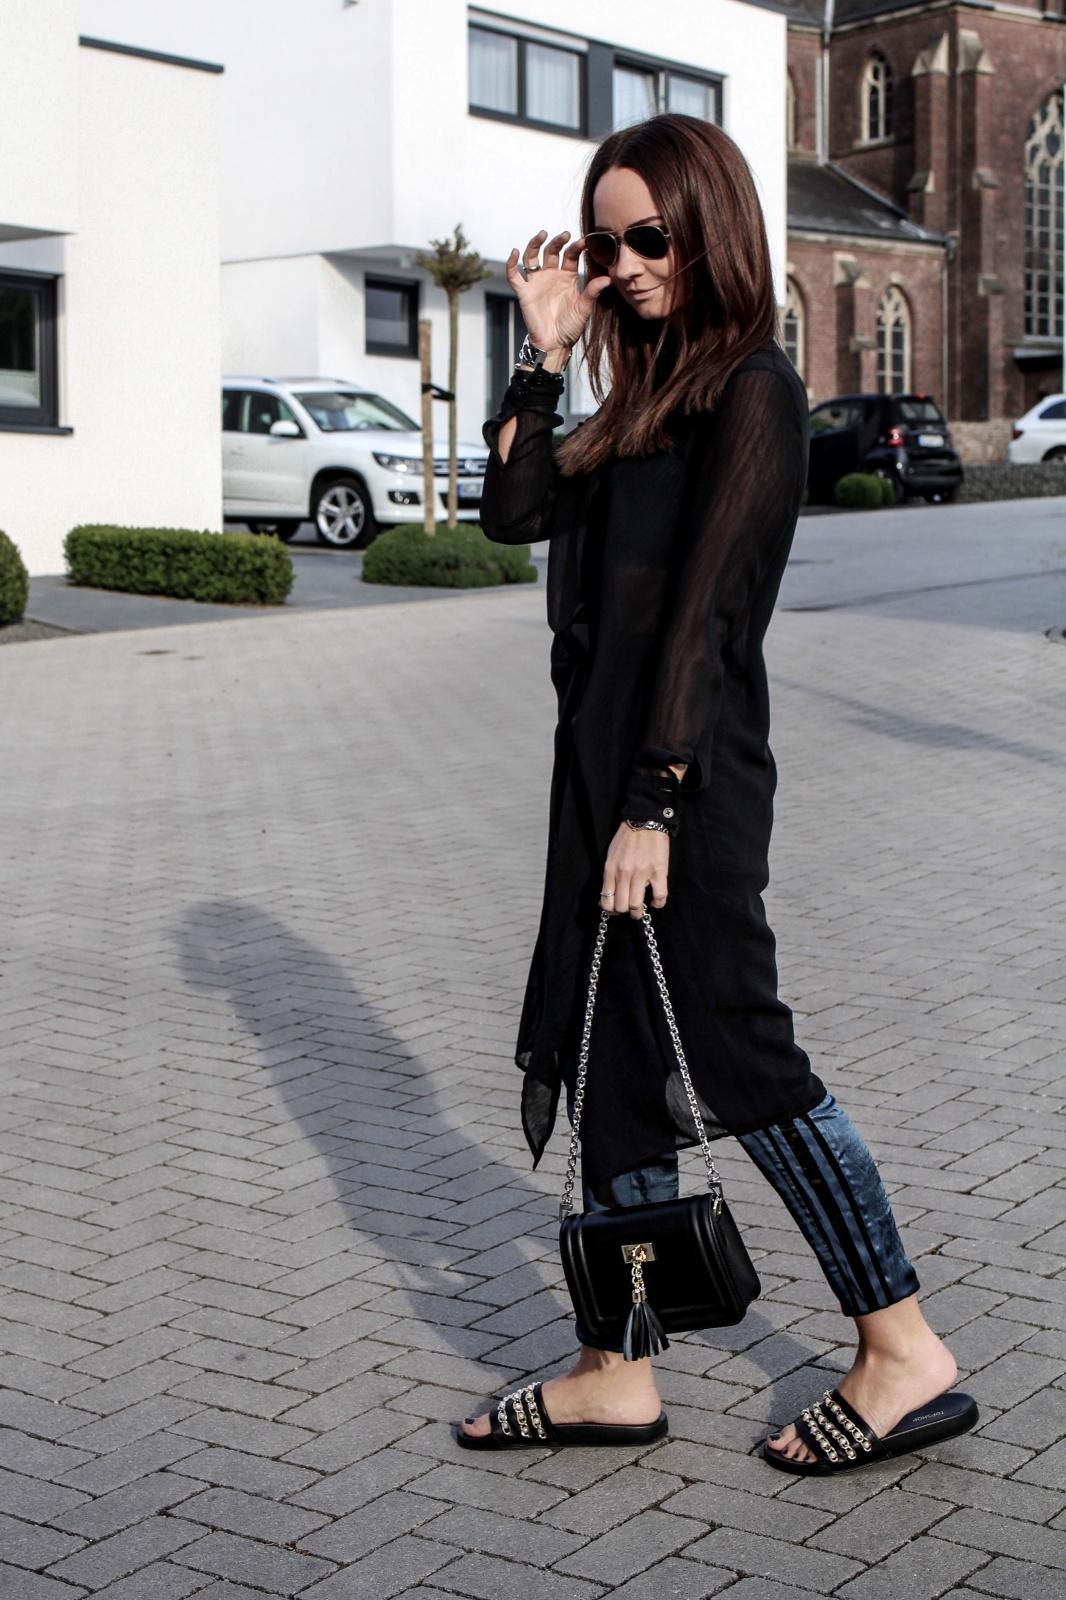 Fashioncircuz by Jenny dalli_caps_waschmittel_fashioncircuz_jennifer__blogger_perlen_portrait_trend_trendcheck-Kopie-1066x1600 Dalli Trendcheck II - PERLEN